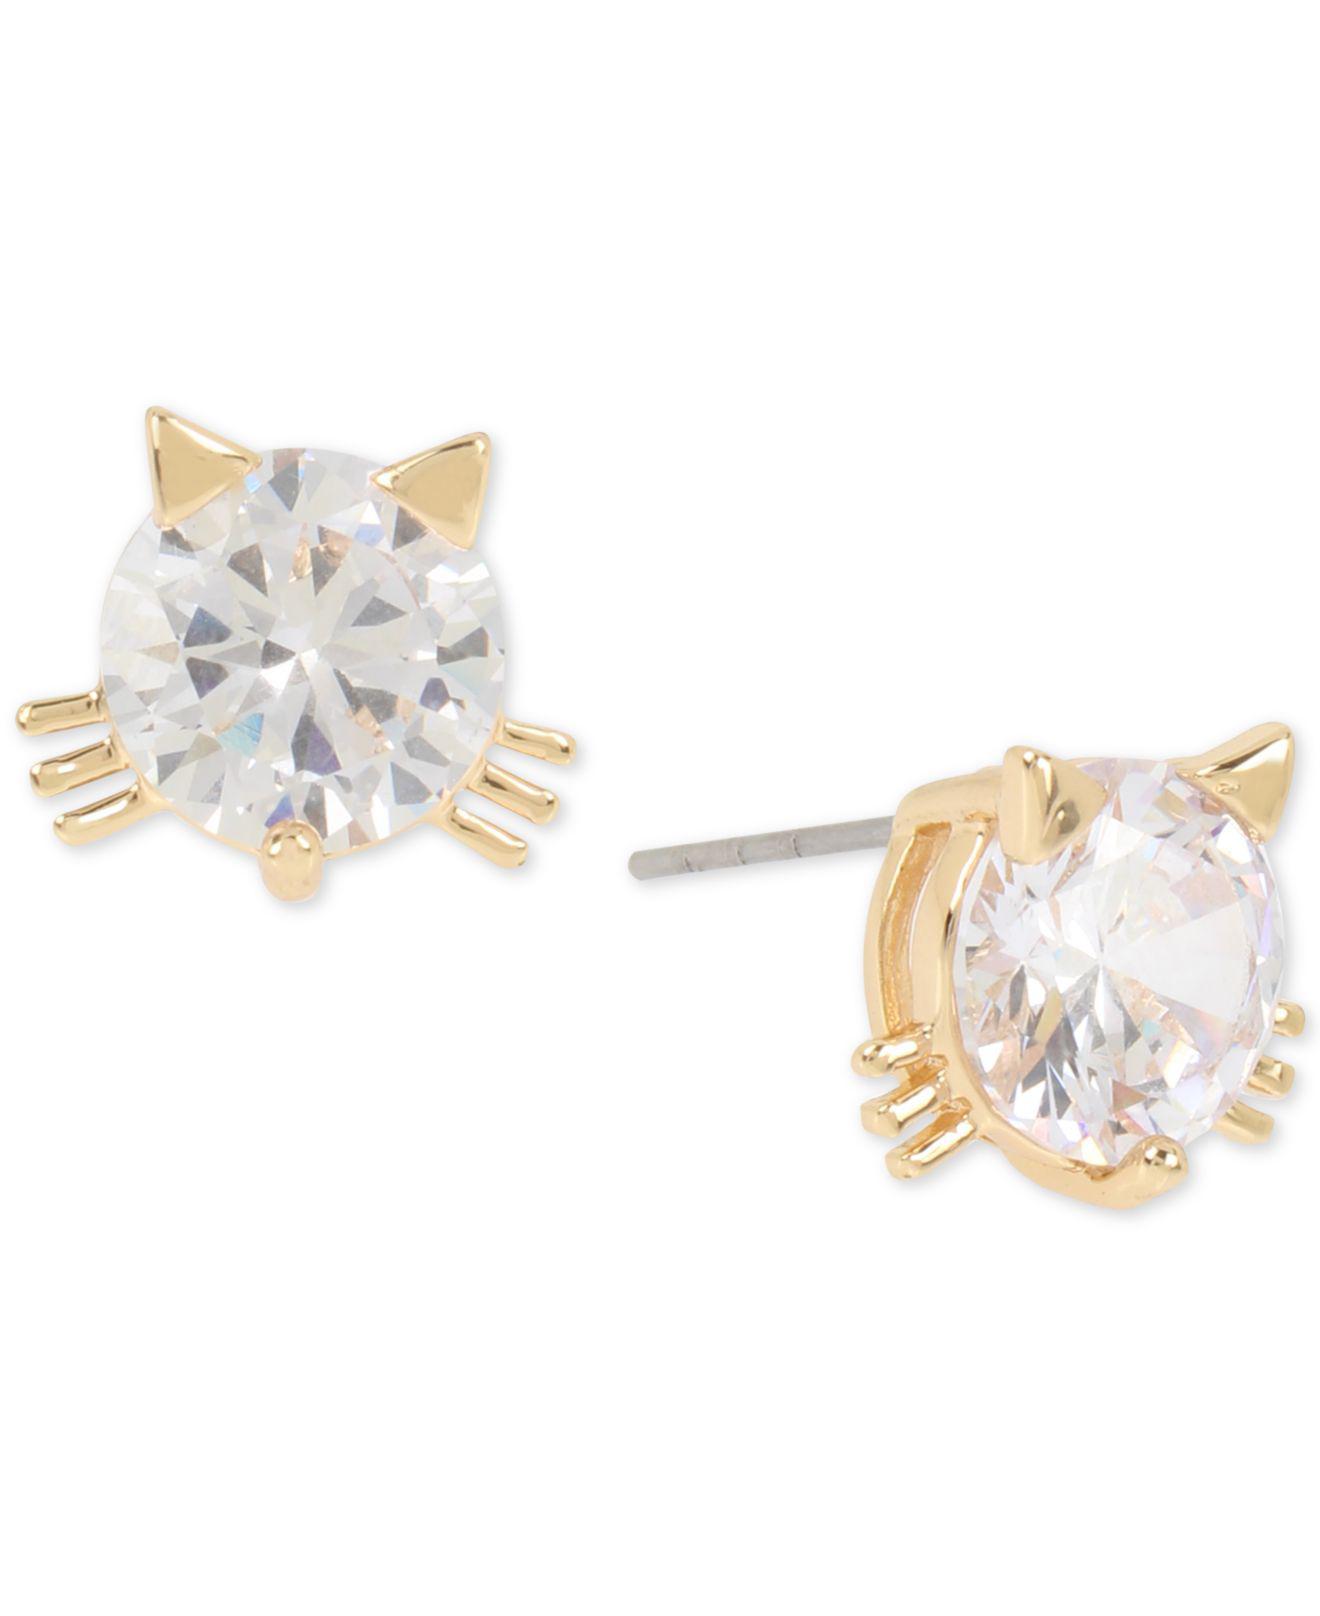 fc1f55248 Lyst - Betsey Johnson Gold-tone Crystal Cat Stud Earrings in Metallic